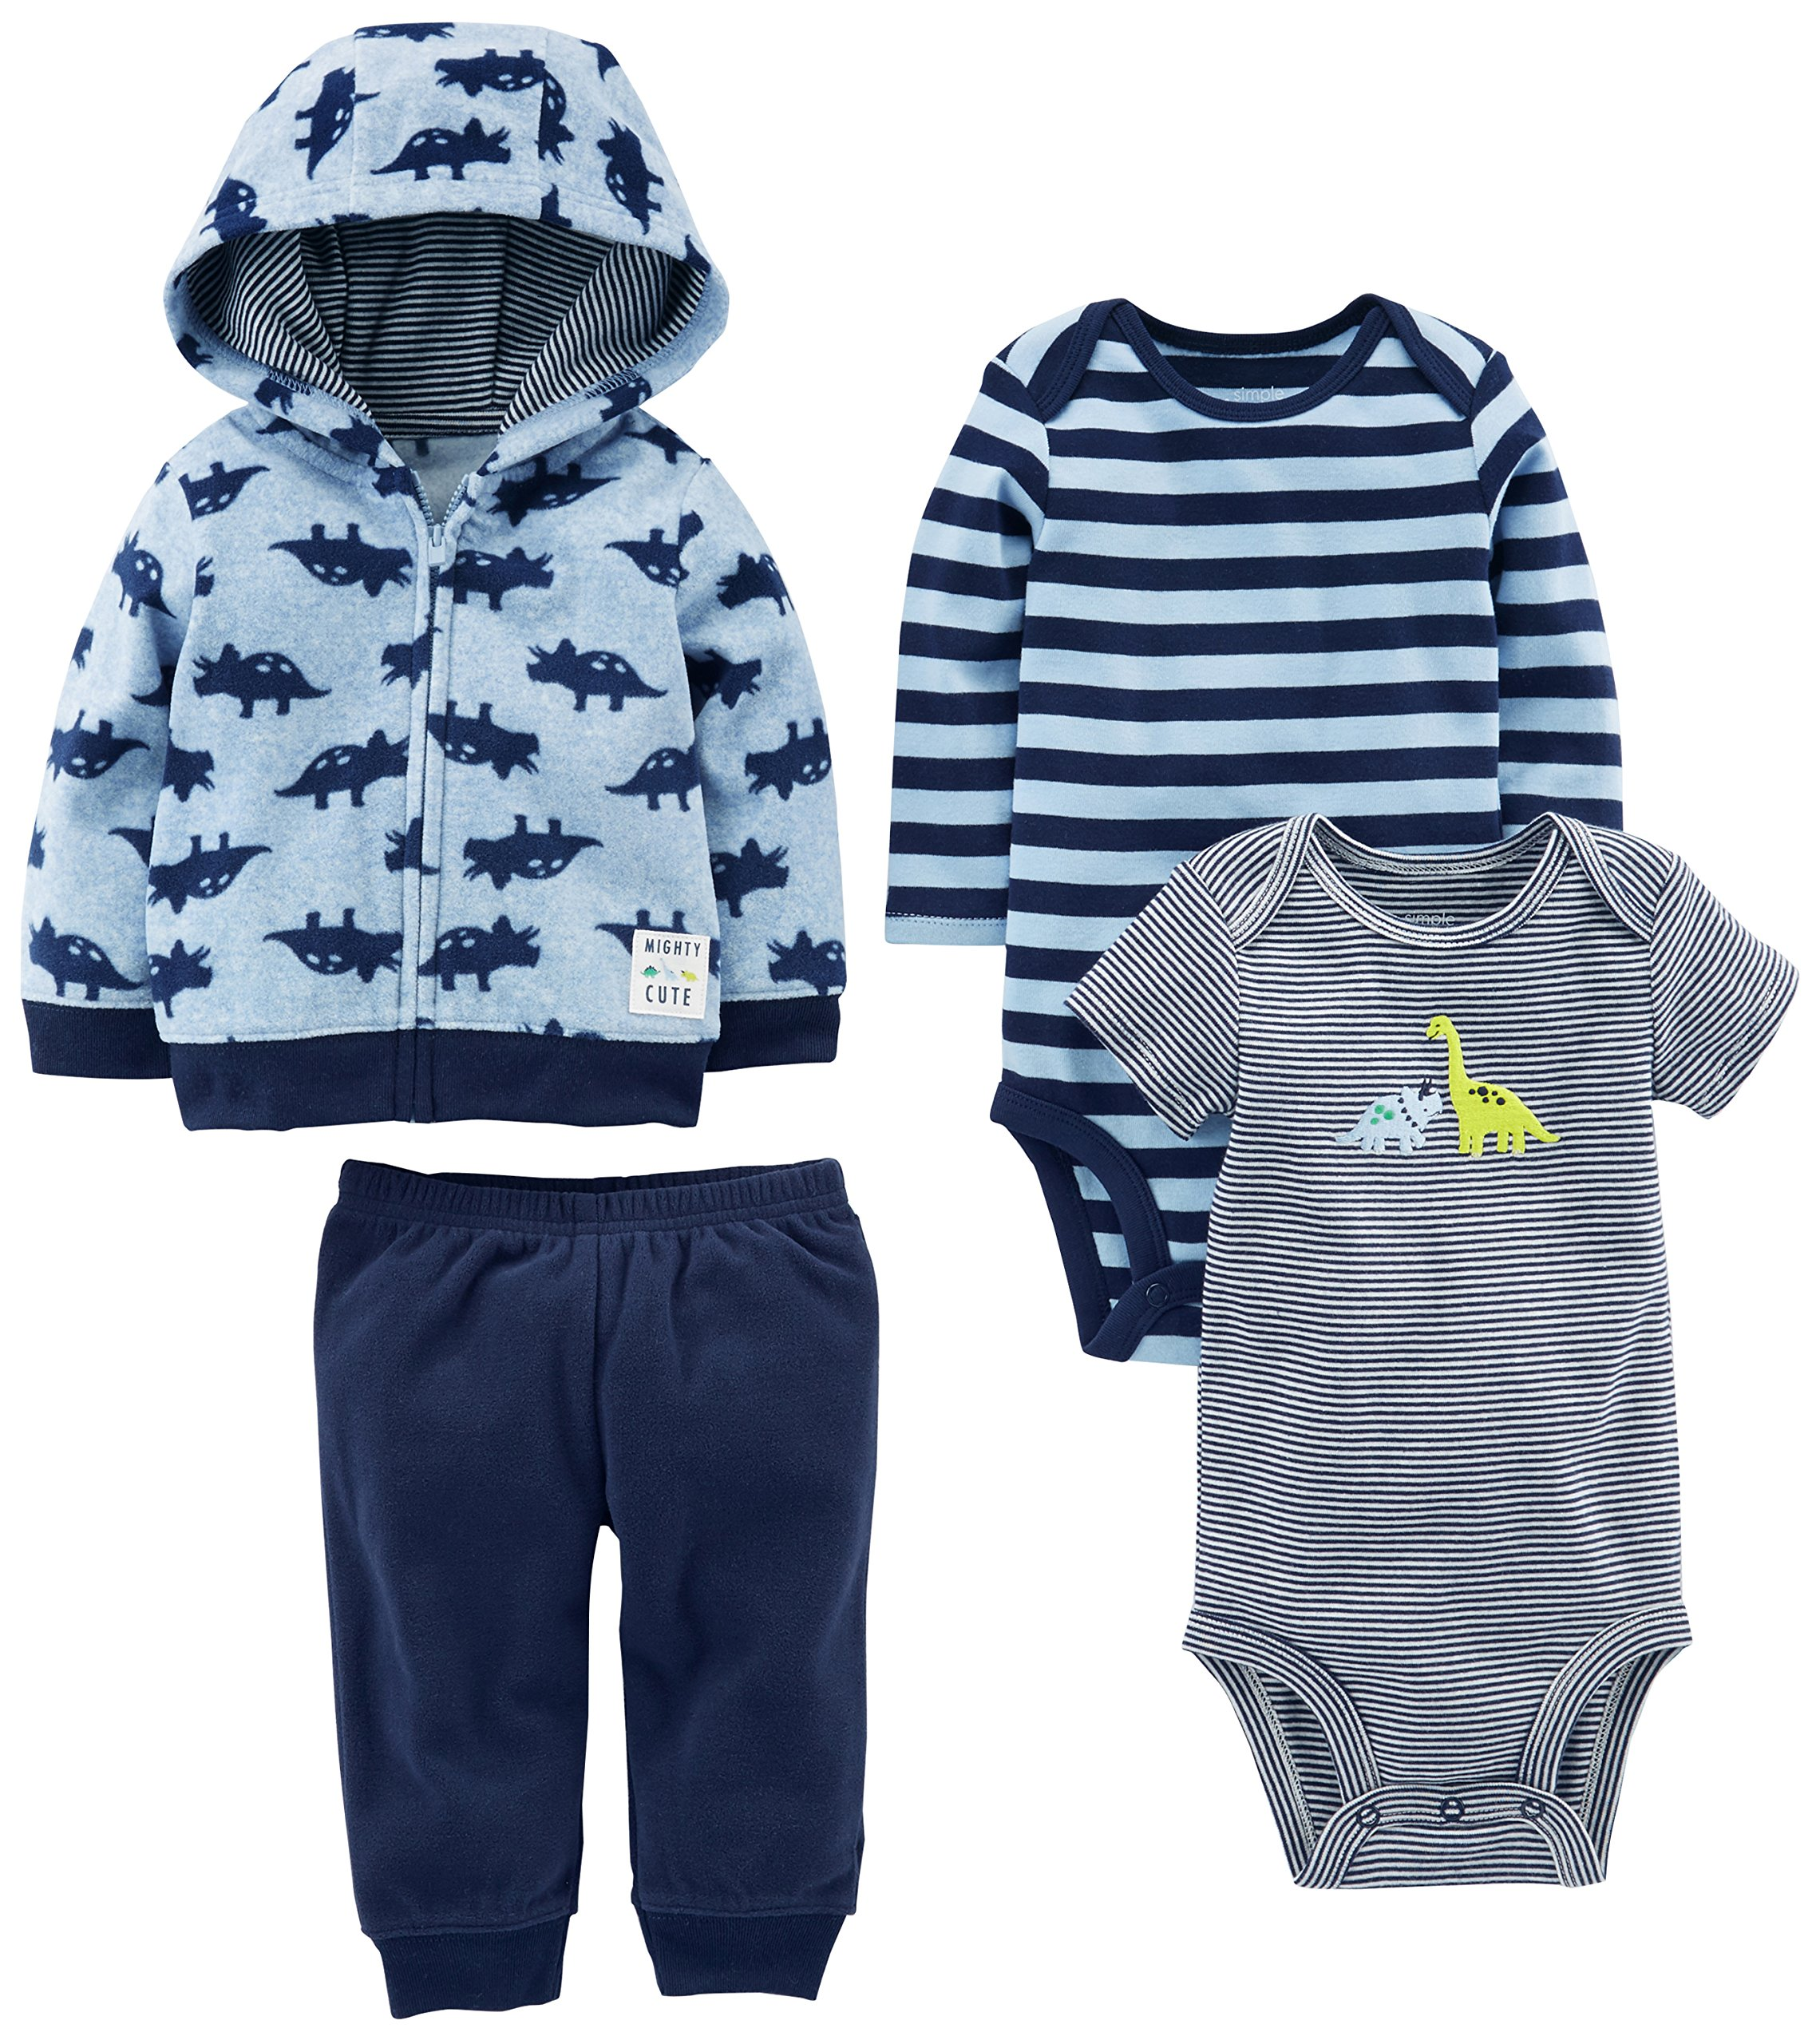 Simple Joys by Carter's Baby Boys' 4-Piece Fleece Jacket Set, Blue Dino, 6-9 Months